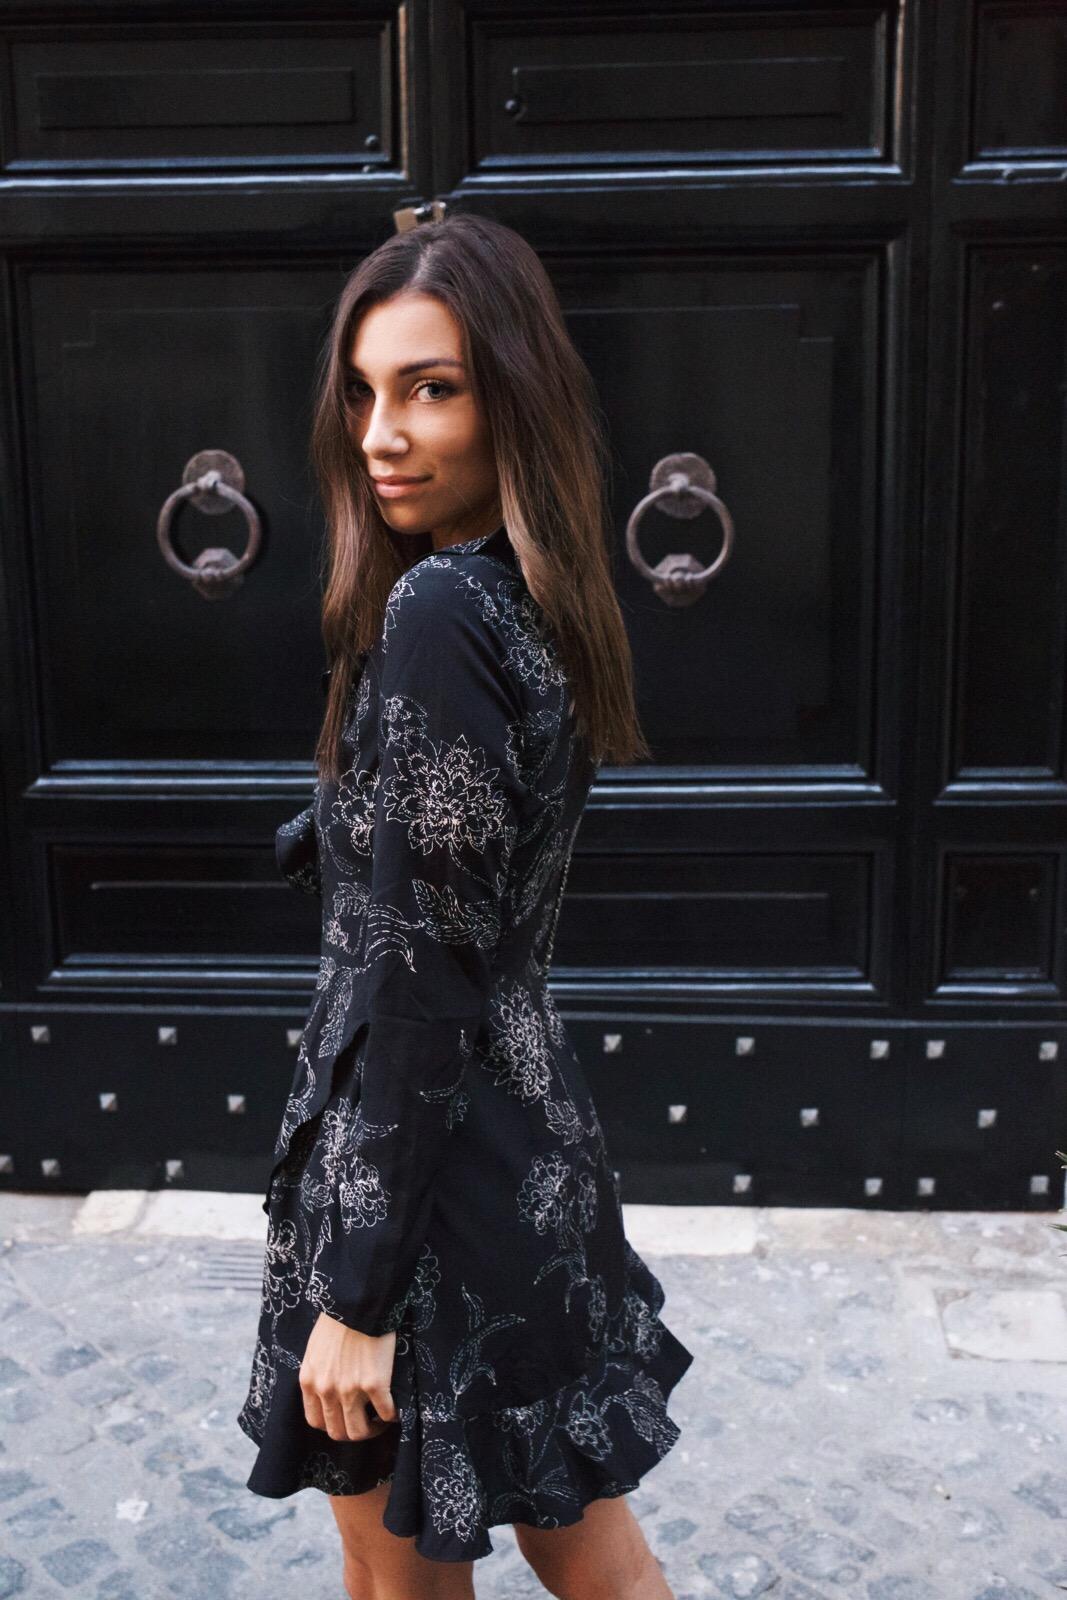 la petite robe noire, maeva dck, rome, lookbook, blogueuse mode, missguided